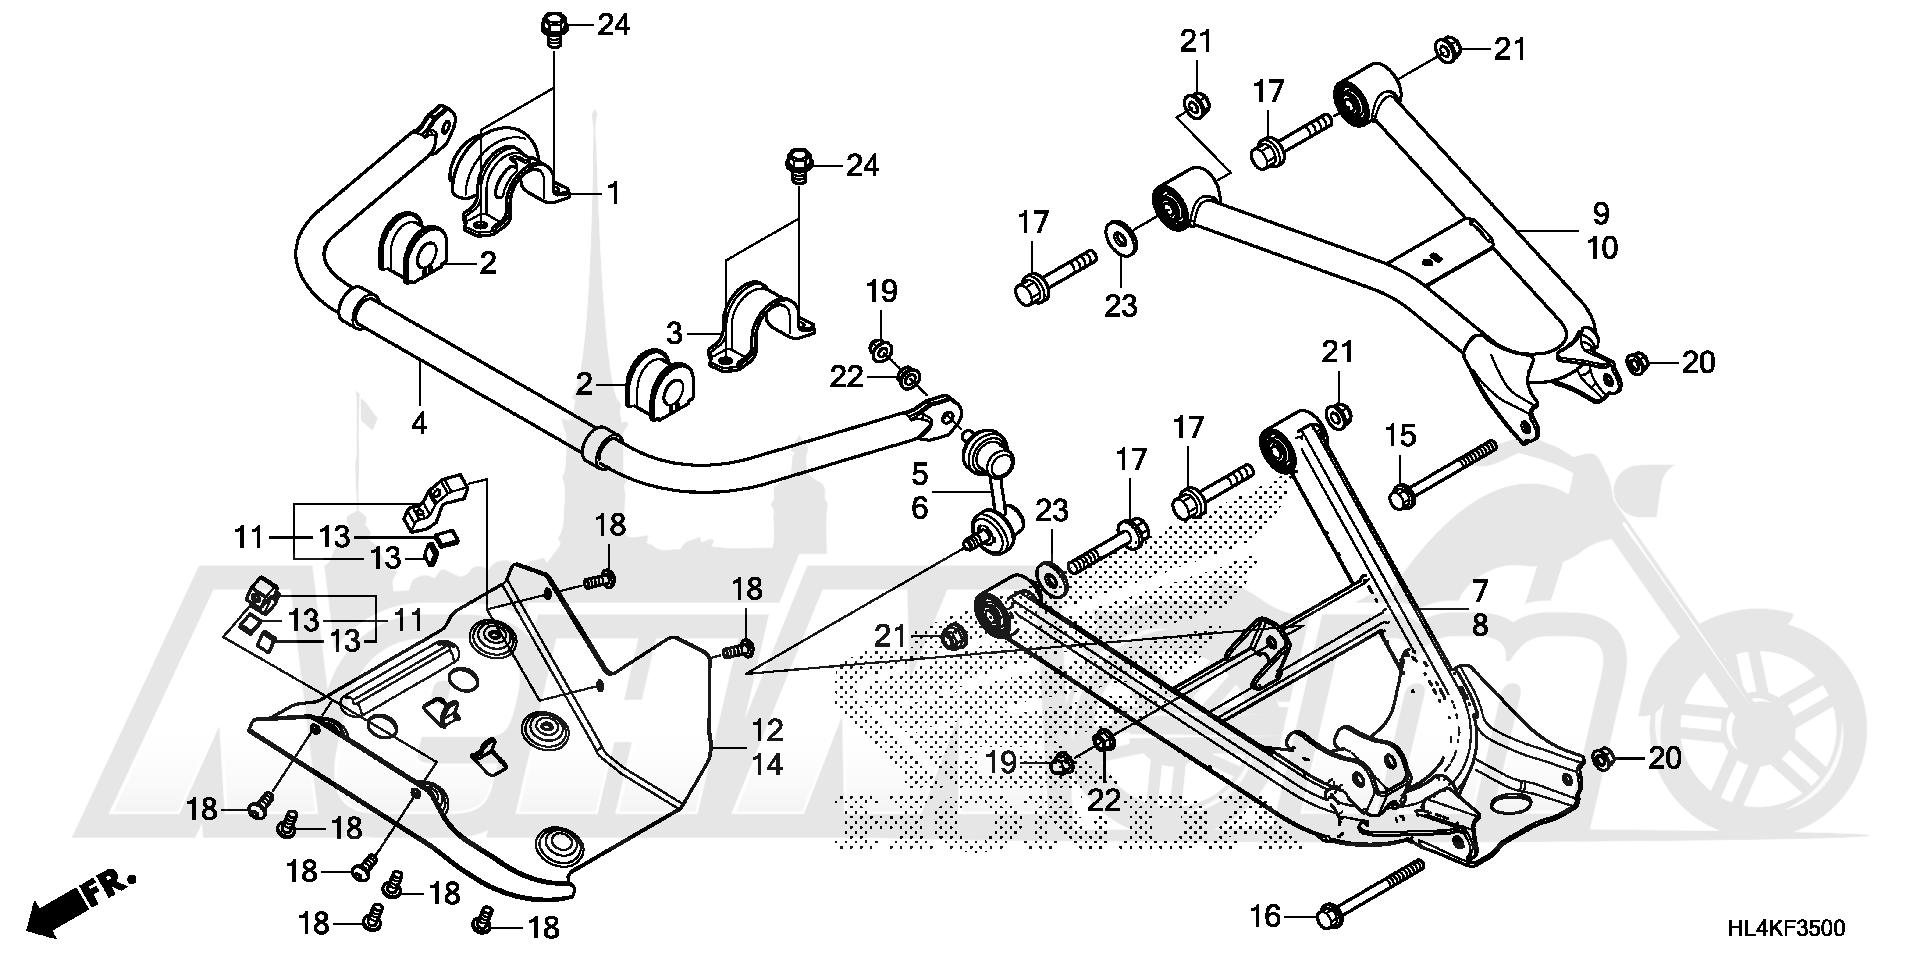 Запчасти для Квадроцикла Honda 2019 SXS1000M5D Раздел: REAR ARM AND REAR STABILIZER | задний рычаг и зад стабилизатор